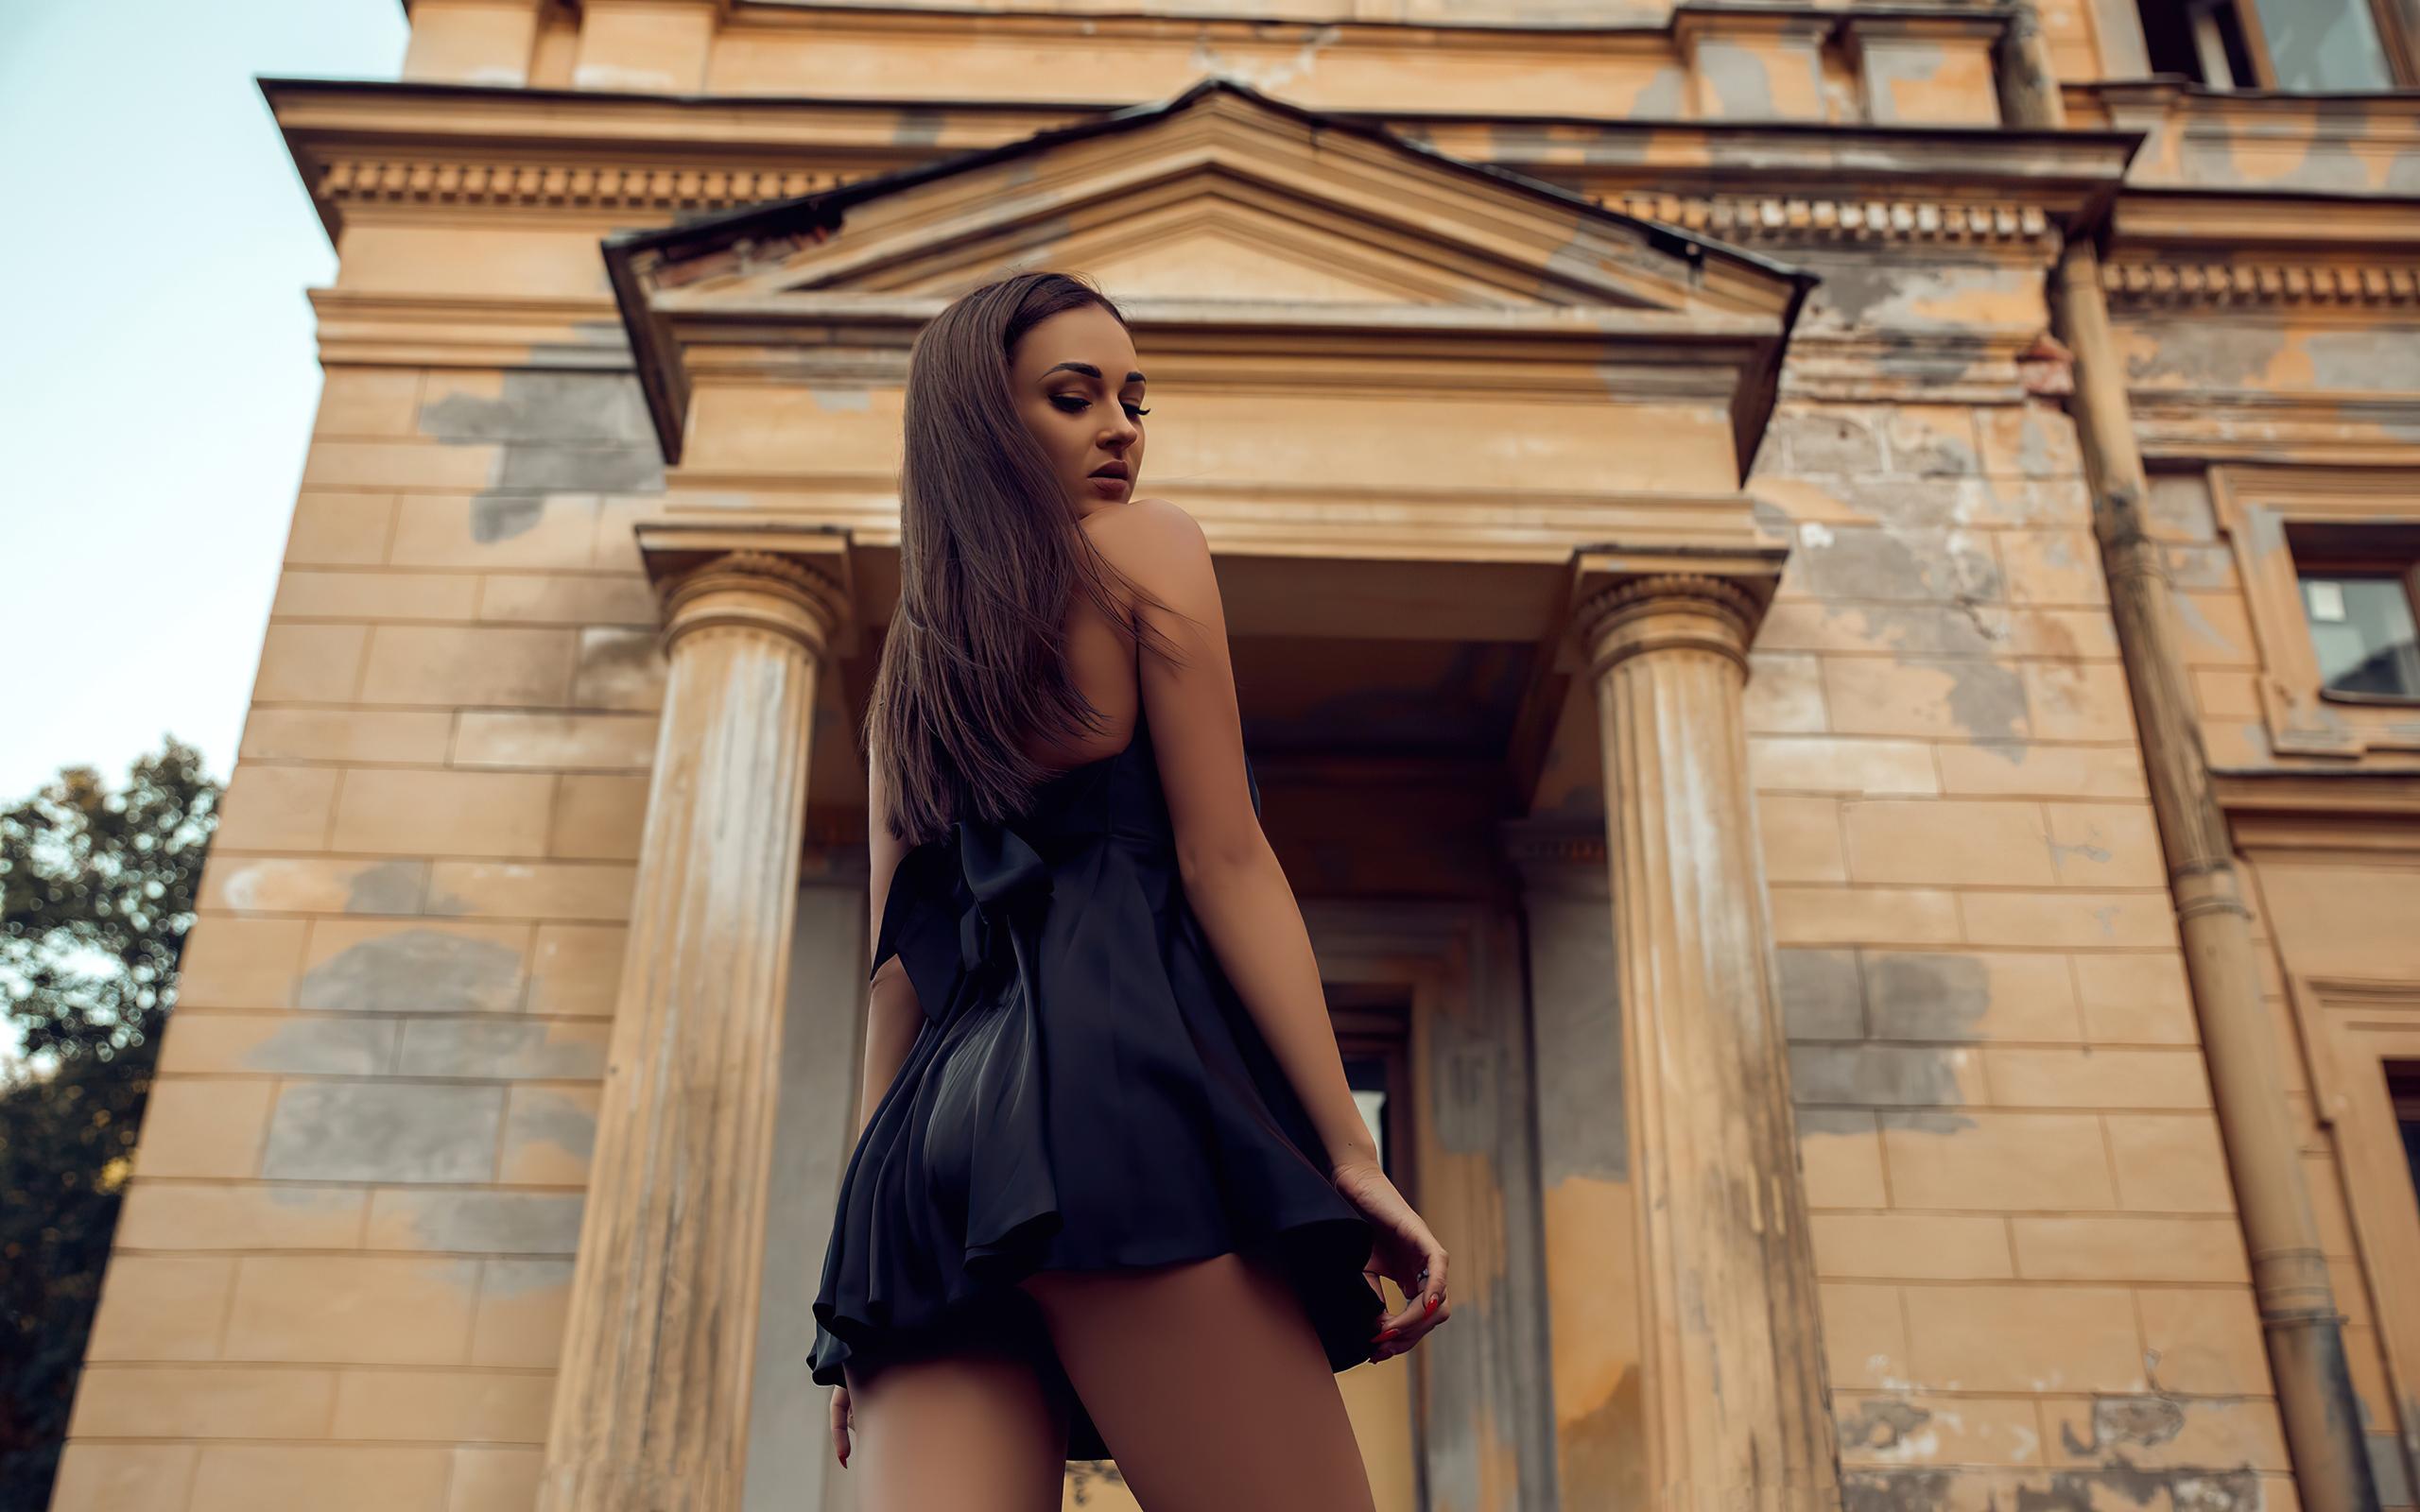 black-clothing-girl-looking-back-4k-qj.jpg